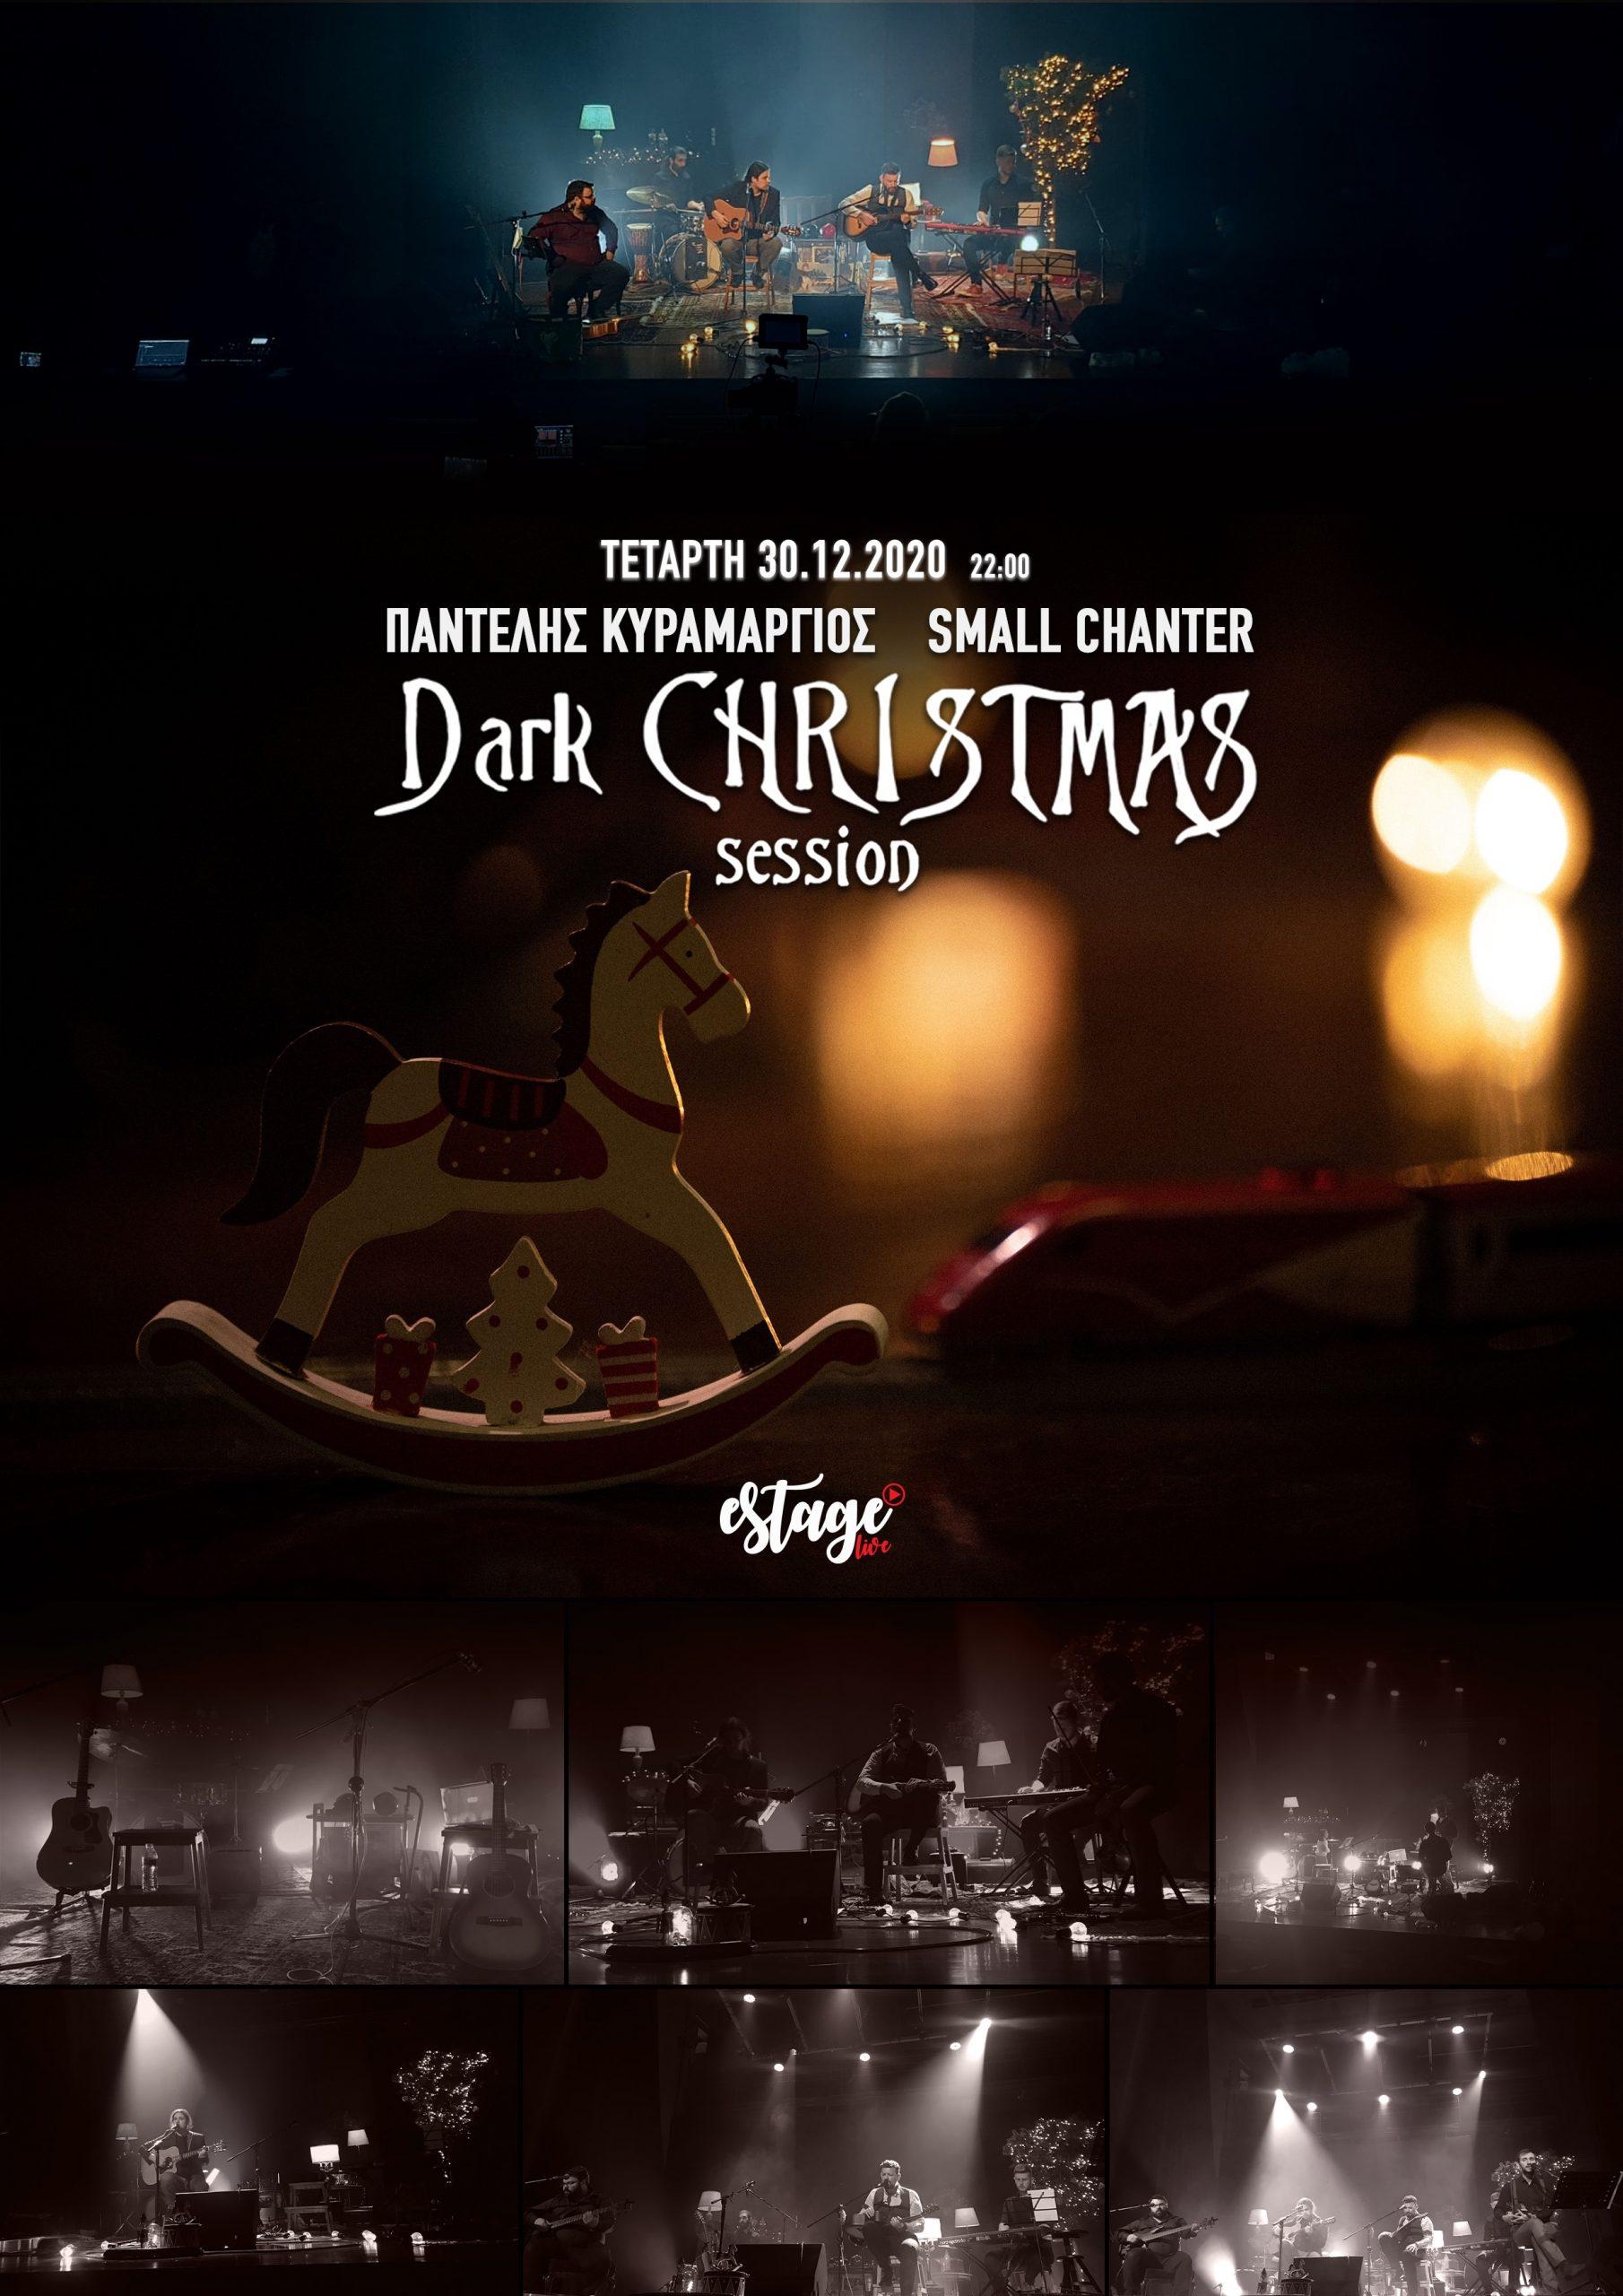 Dark Christmas Session – Παντελής Κυραμαργιός / Small Chanter